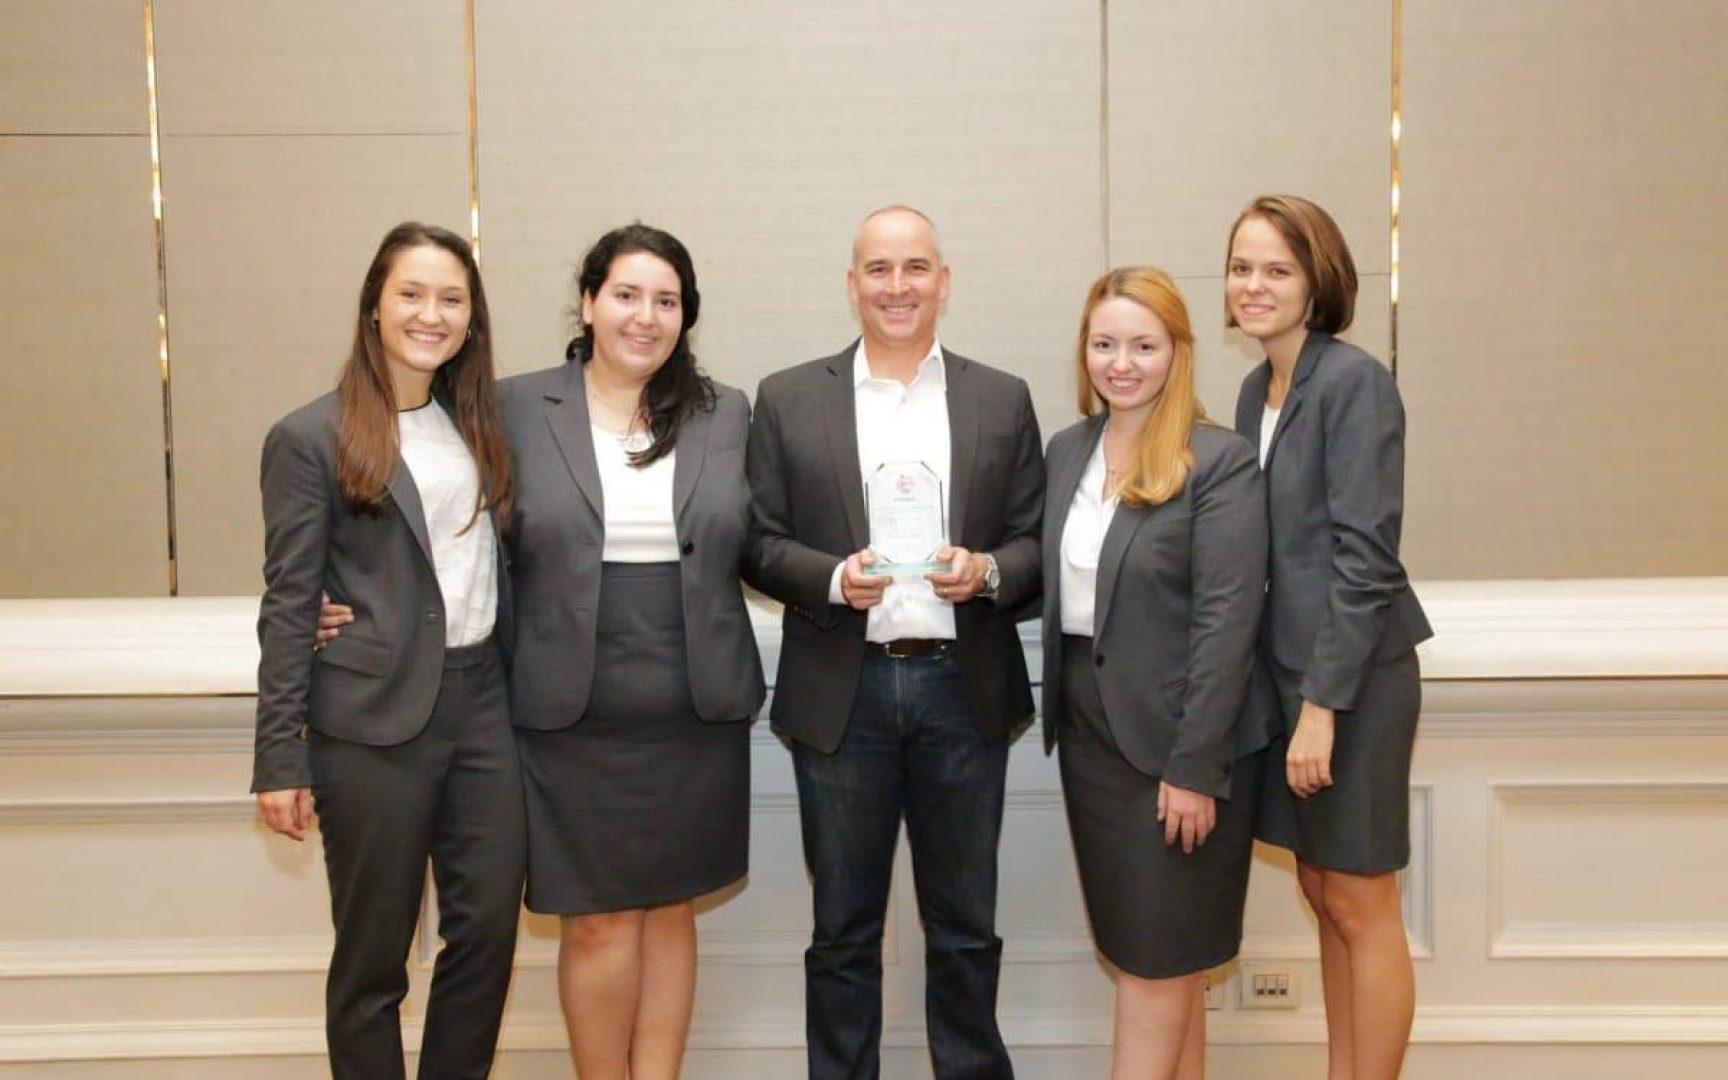 Olivia Piatkowski, Ophir Rotem, Dr. Sean Limon, Victoria Edison and Cathleen Maluda.